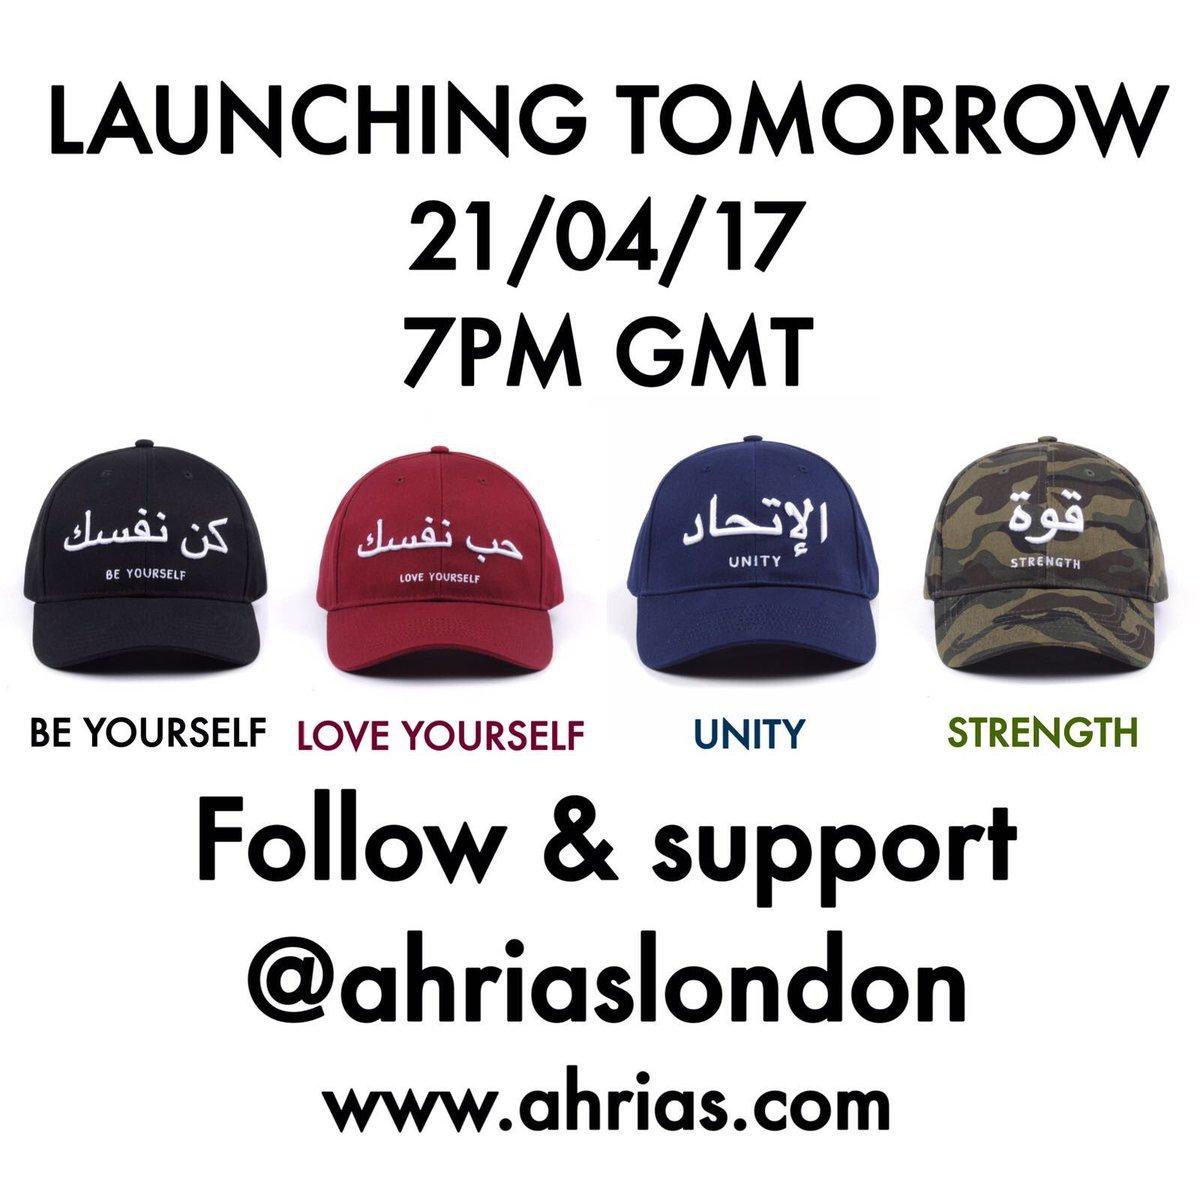 LAUNCH TODAY 21.04.2017 (7PM GMT) Which is your favourite? #JummahMubarak #jummah #CeltaVigo #UnleashDefeat #london #fashion #blog #ahrias<br>http://pic.twitter.com/a1Yju5QJy9